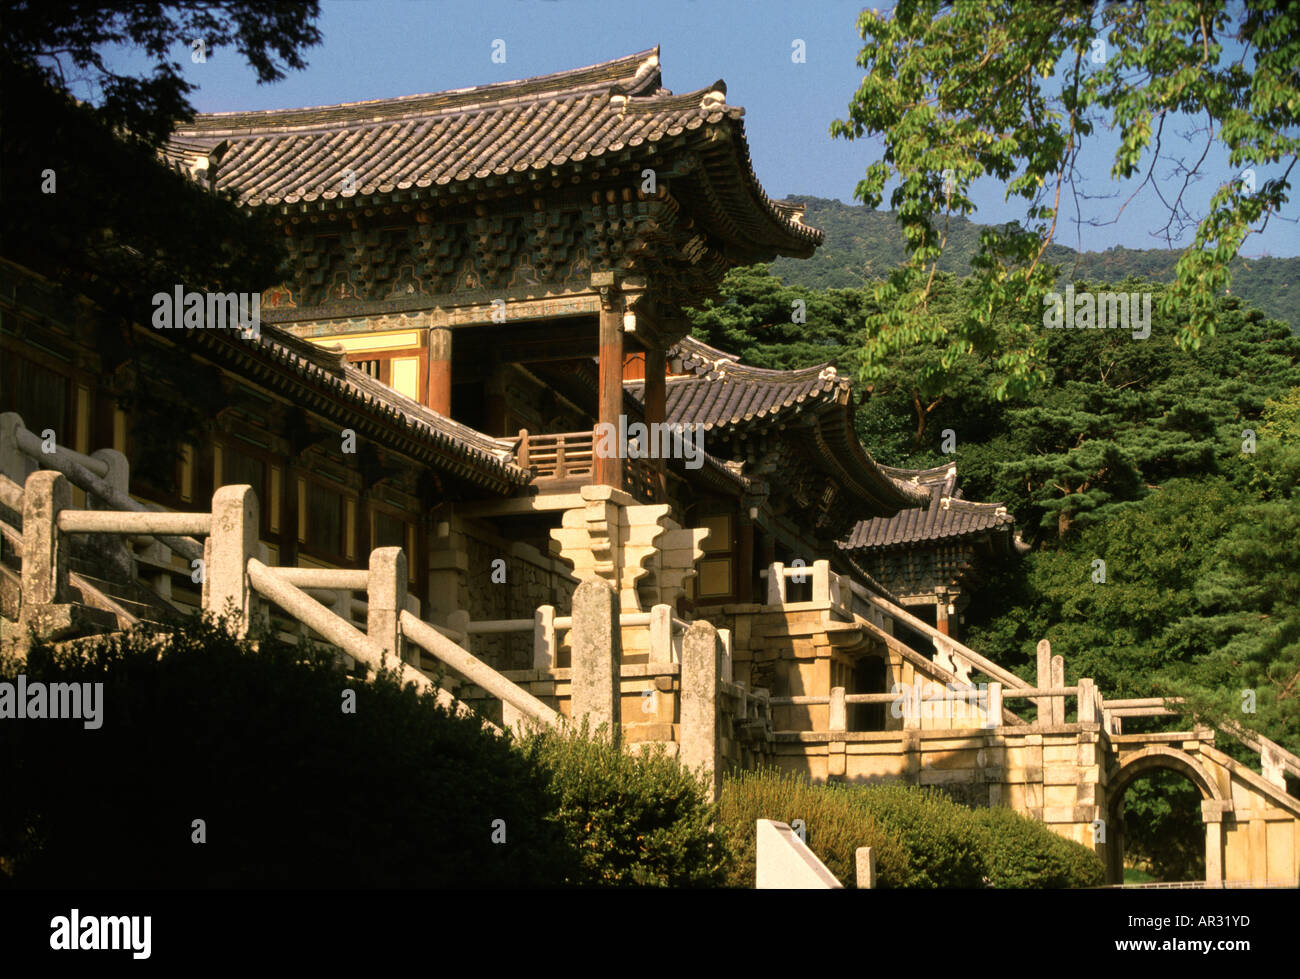 Pulguk-sa temple UNESCO world heritage, Geongju, Geongju, South Korea Asia - Stock Image